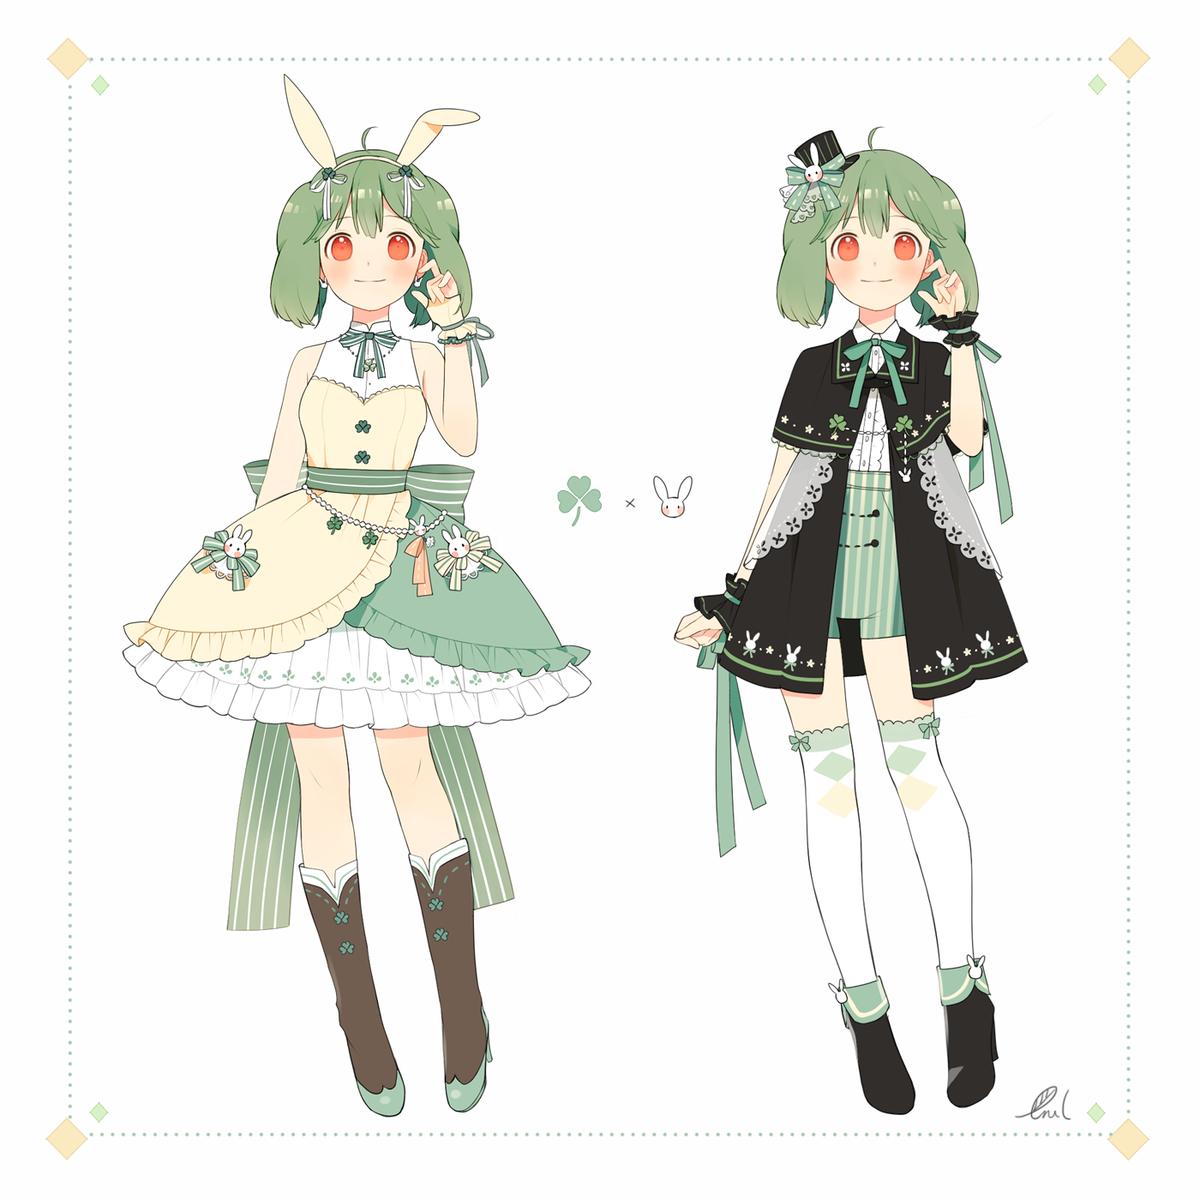 [SUKJA]숙자(SUKJA_1114)さん Twitter Character design